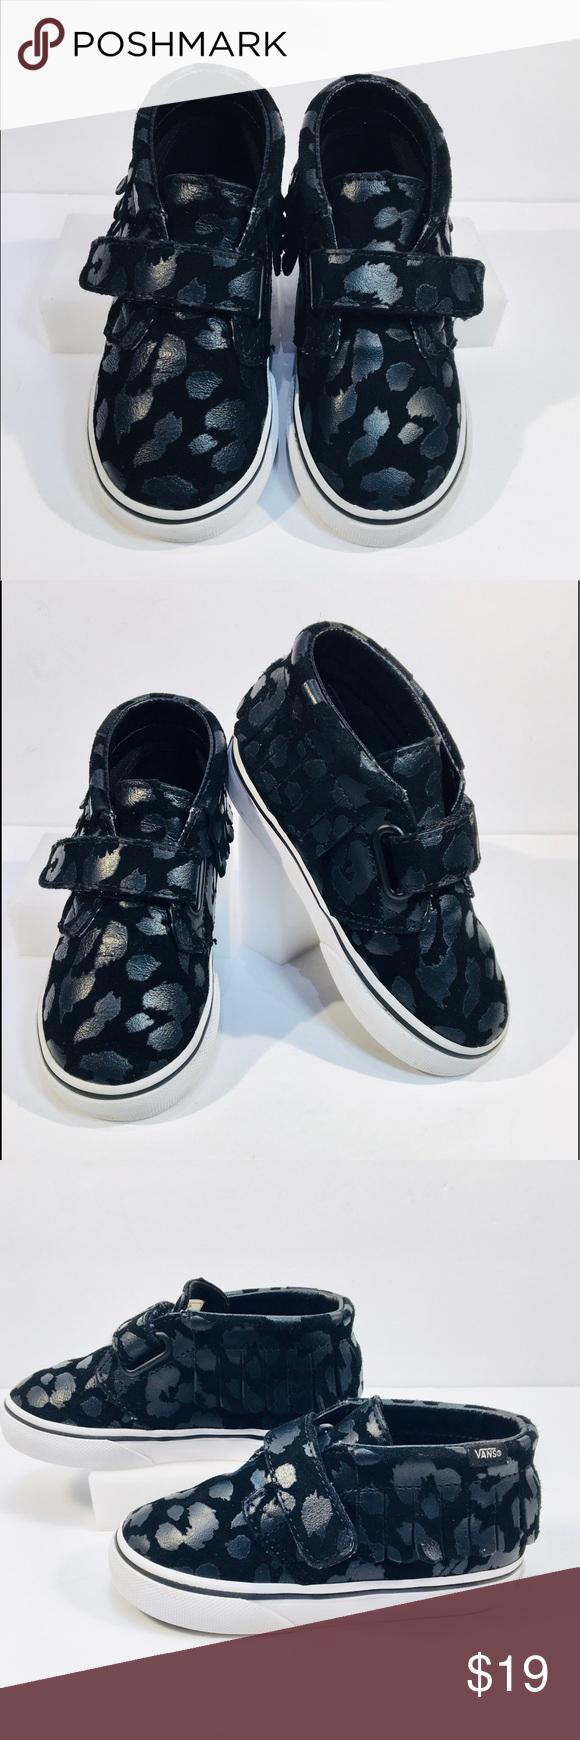 cde0968fc675f4 Vans Toddler Black Gray Sneaker Toddler Black   Metallic Gray Canvas High  Top Sneakers. Velcro Side Closure. Size 8. EUC Vans Shoes Sneakers